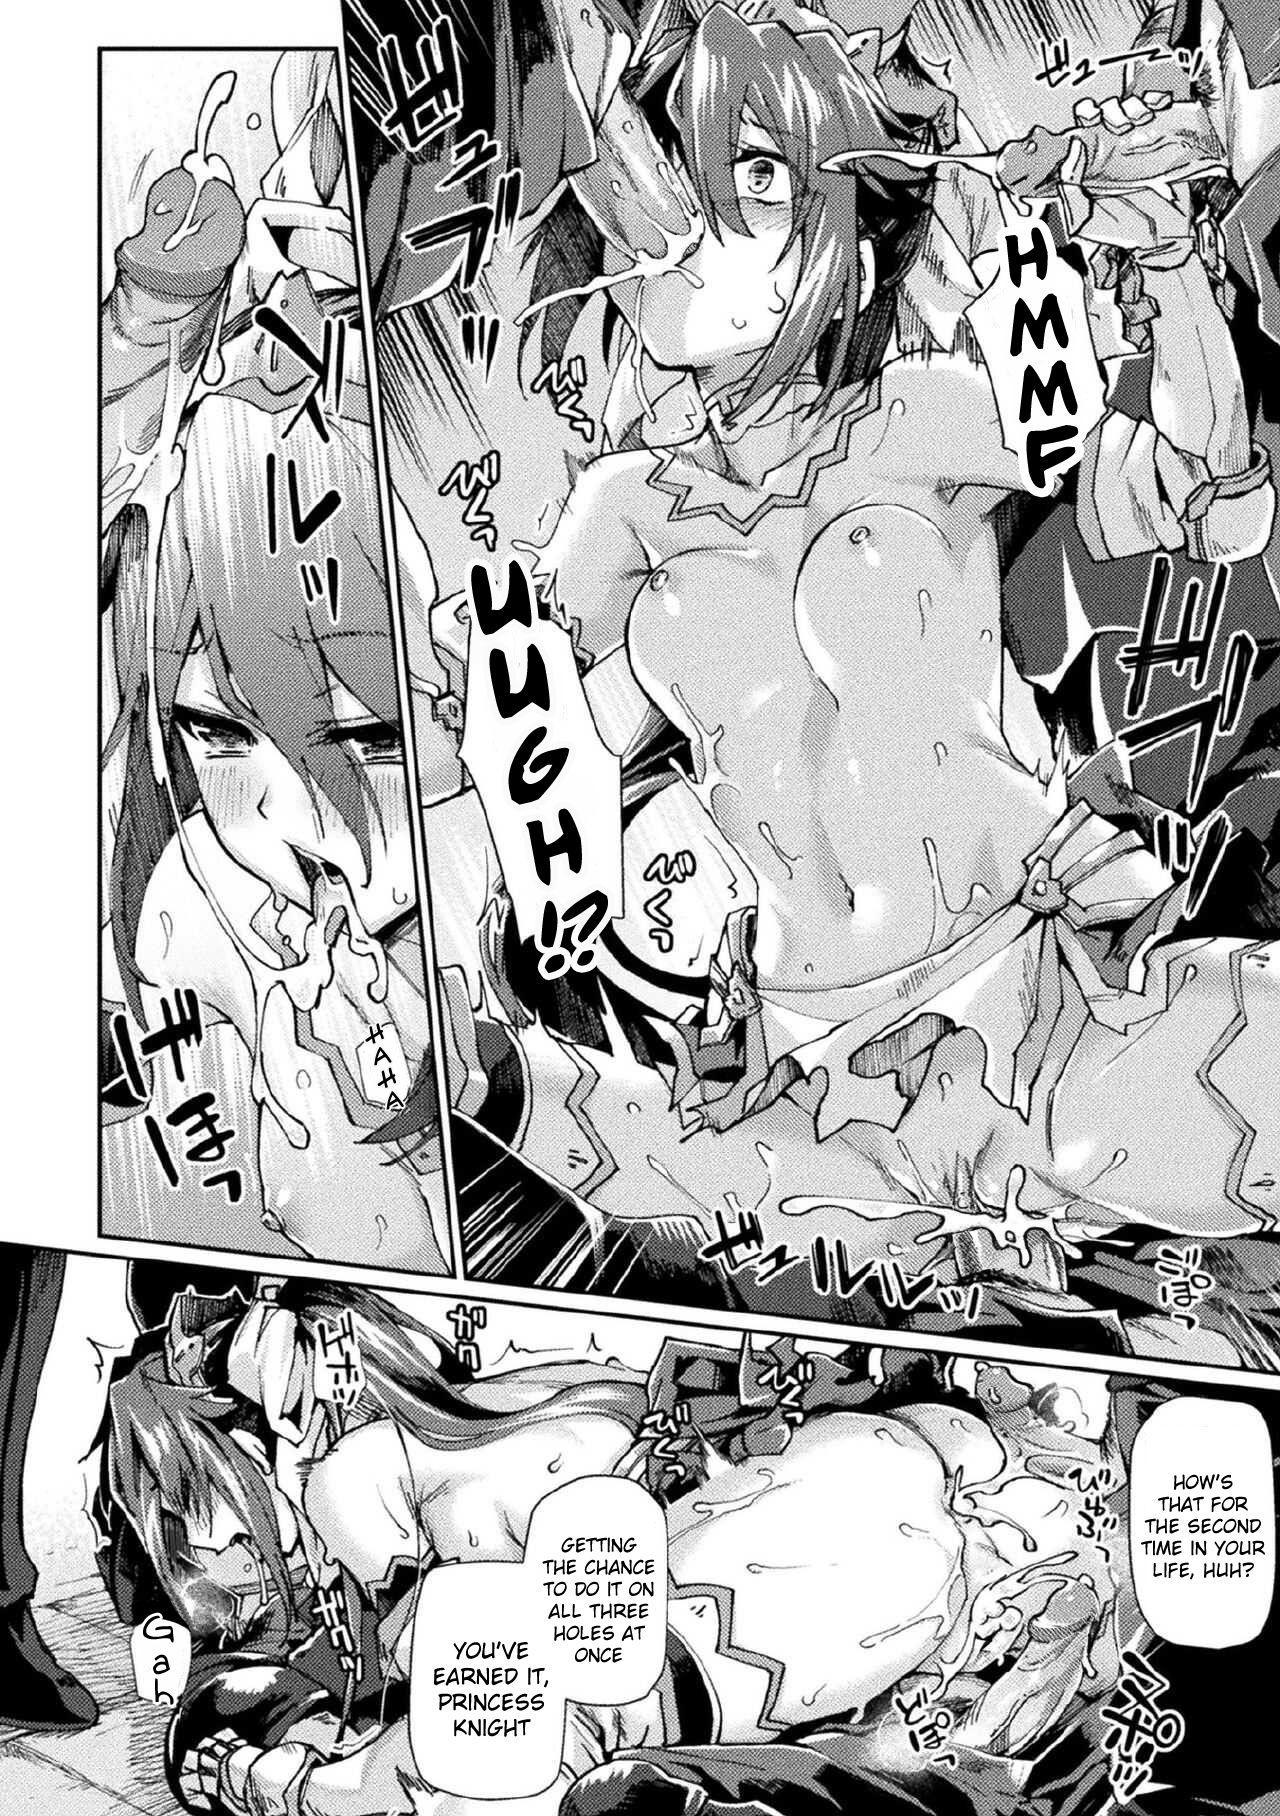 [Tsukitokage] Kuroinu II ~Inyoku ni Somaru Haitoku no Miyako, Futatabi~ THE COMIC Chapter 7 (Kukkoro Heroines Vol. 9) [English] [Decensored] (Klub Kemoner) [Digital] 17